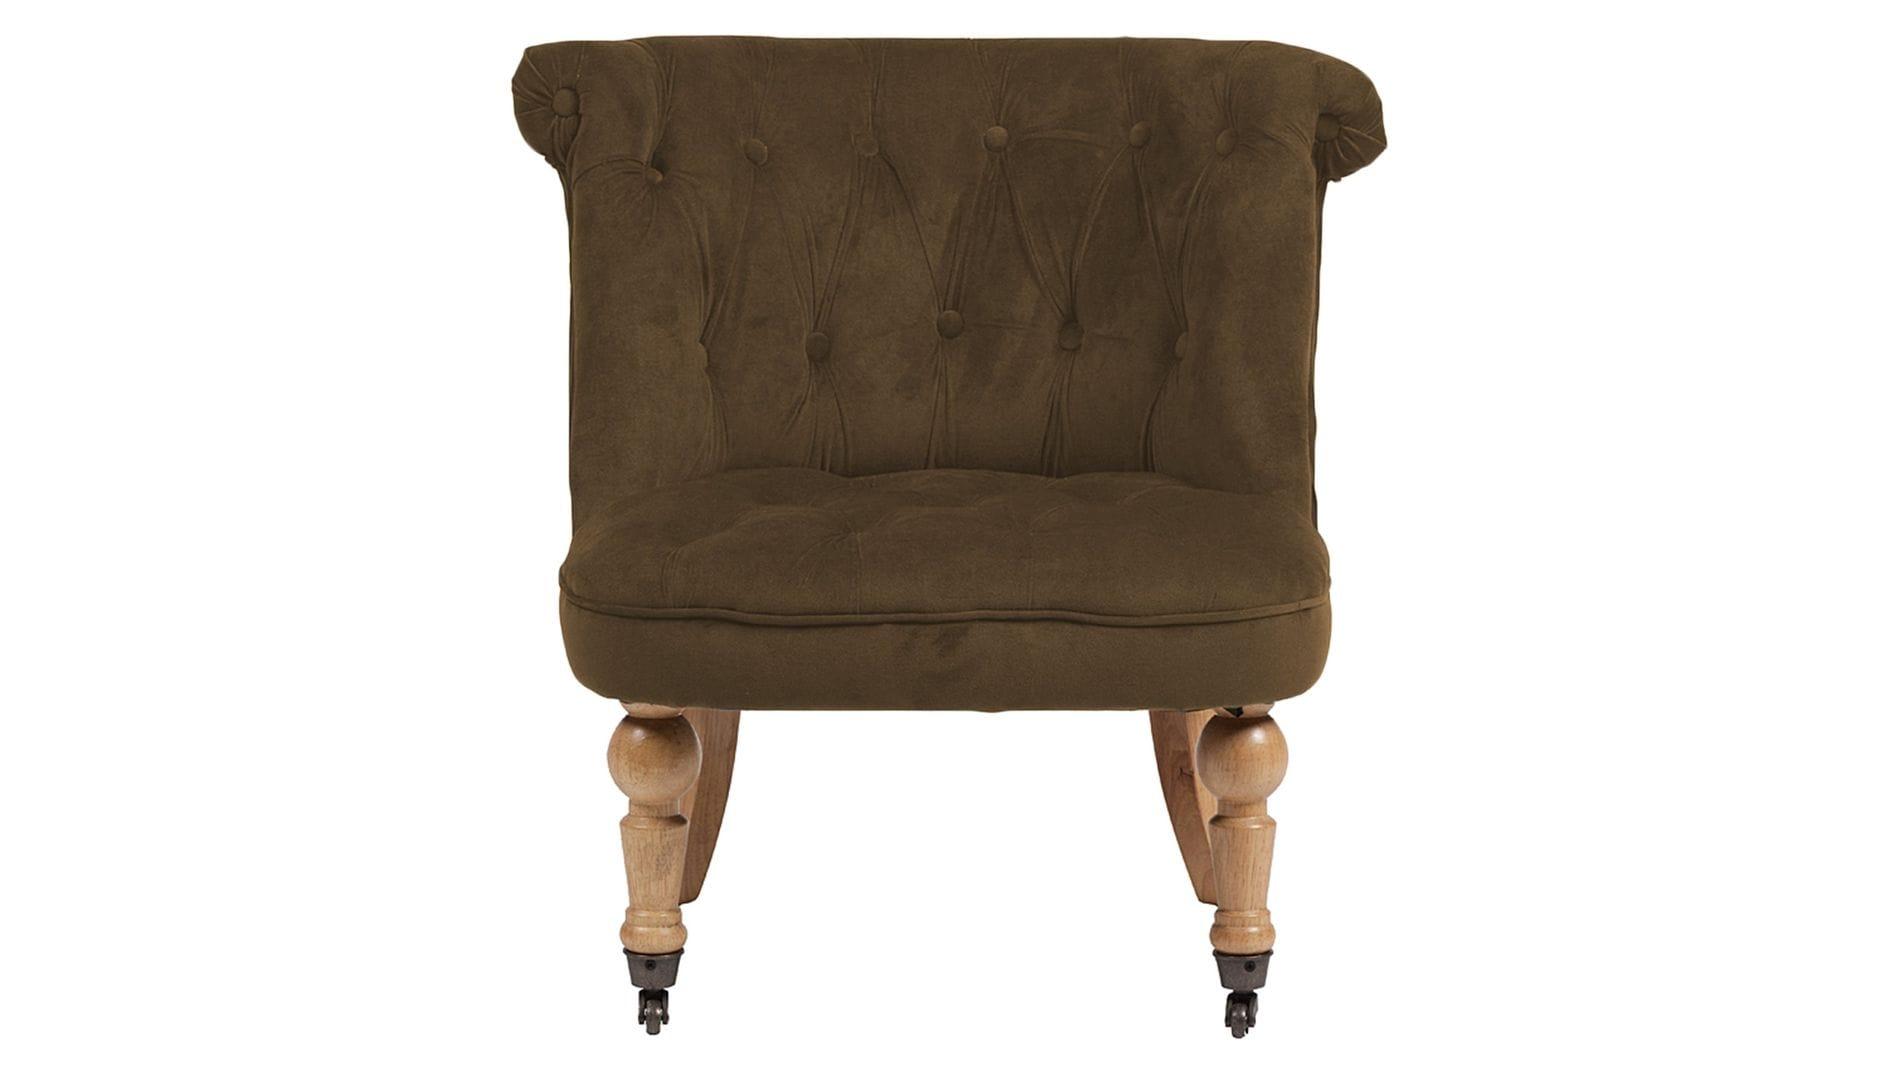 Кресло Amelie French Country Chair Тёмно- Коричневый Велюр М